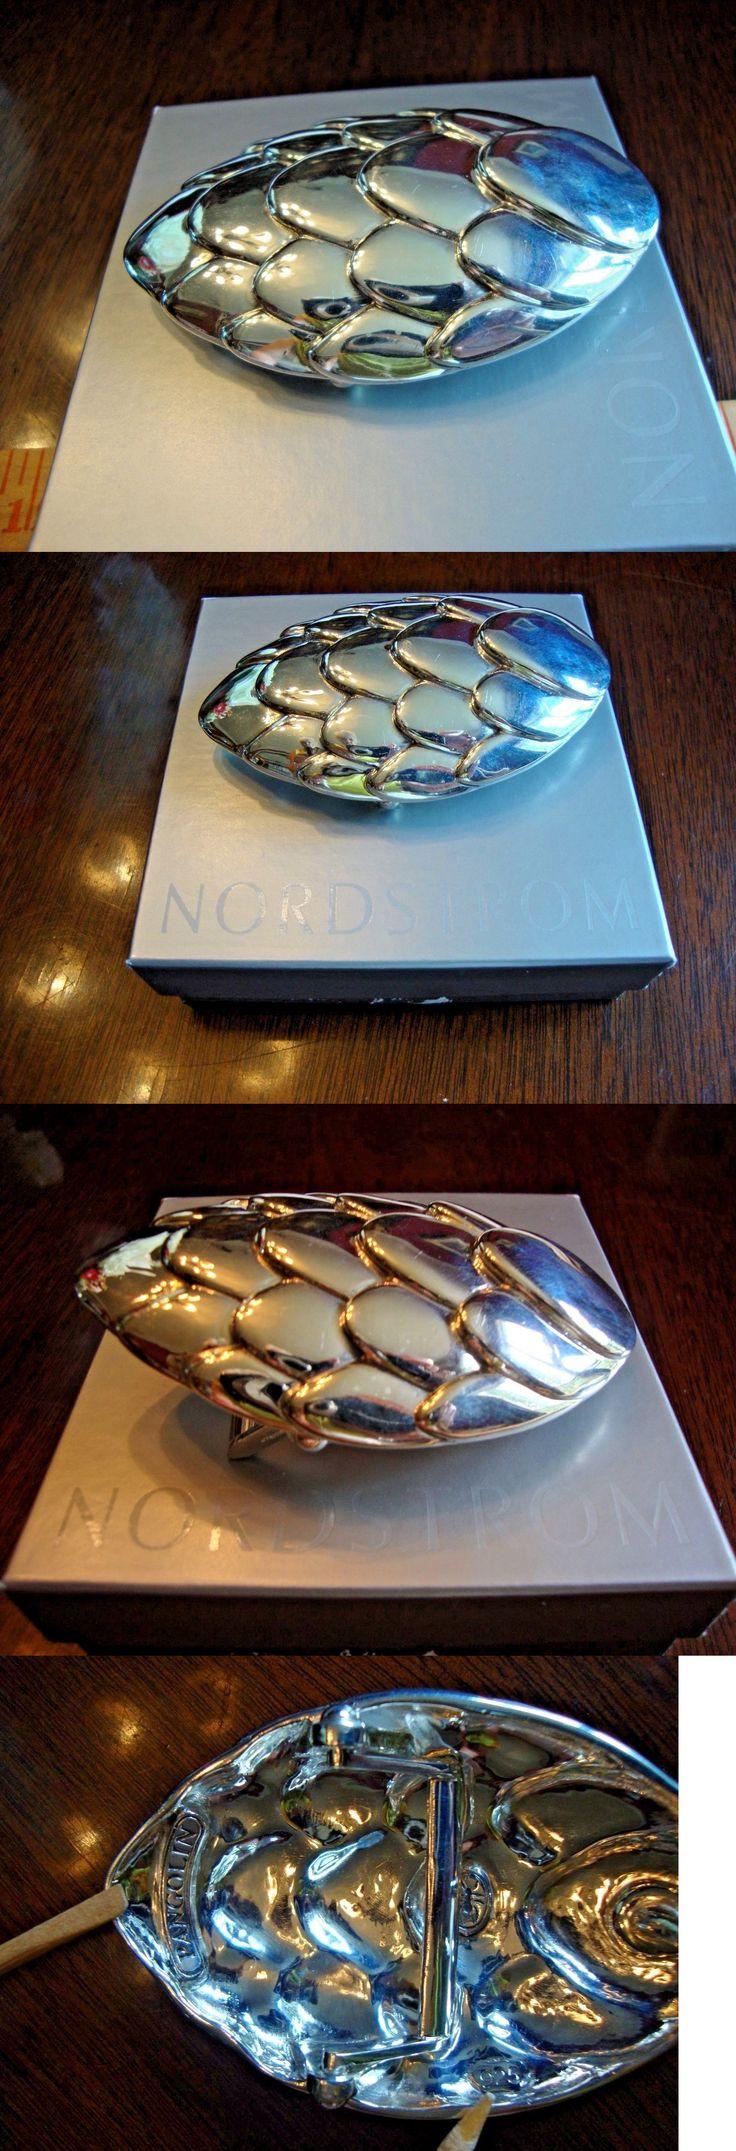 Belt Buckles 86647: New African Pangolin 925 Sterling Silver Belt Buckle: 3.75 W X 2 D, Msrp $348 Uk -> BUY IT NOW ONLY: $115 on eBay!